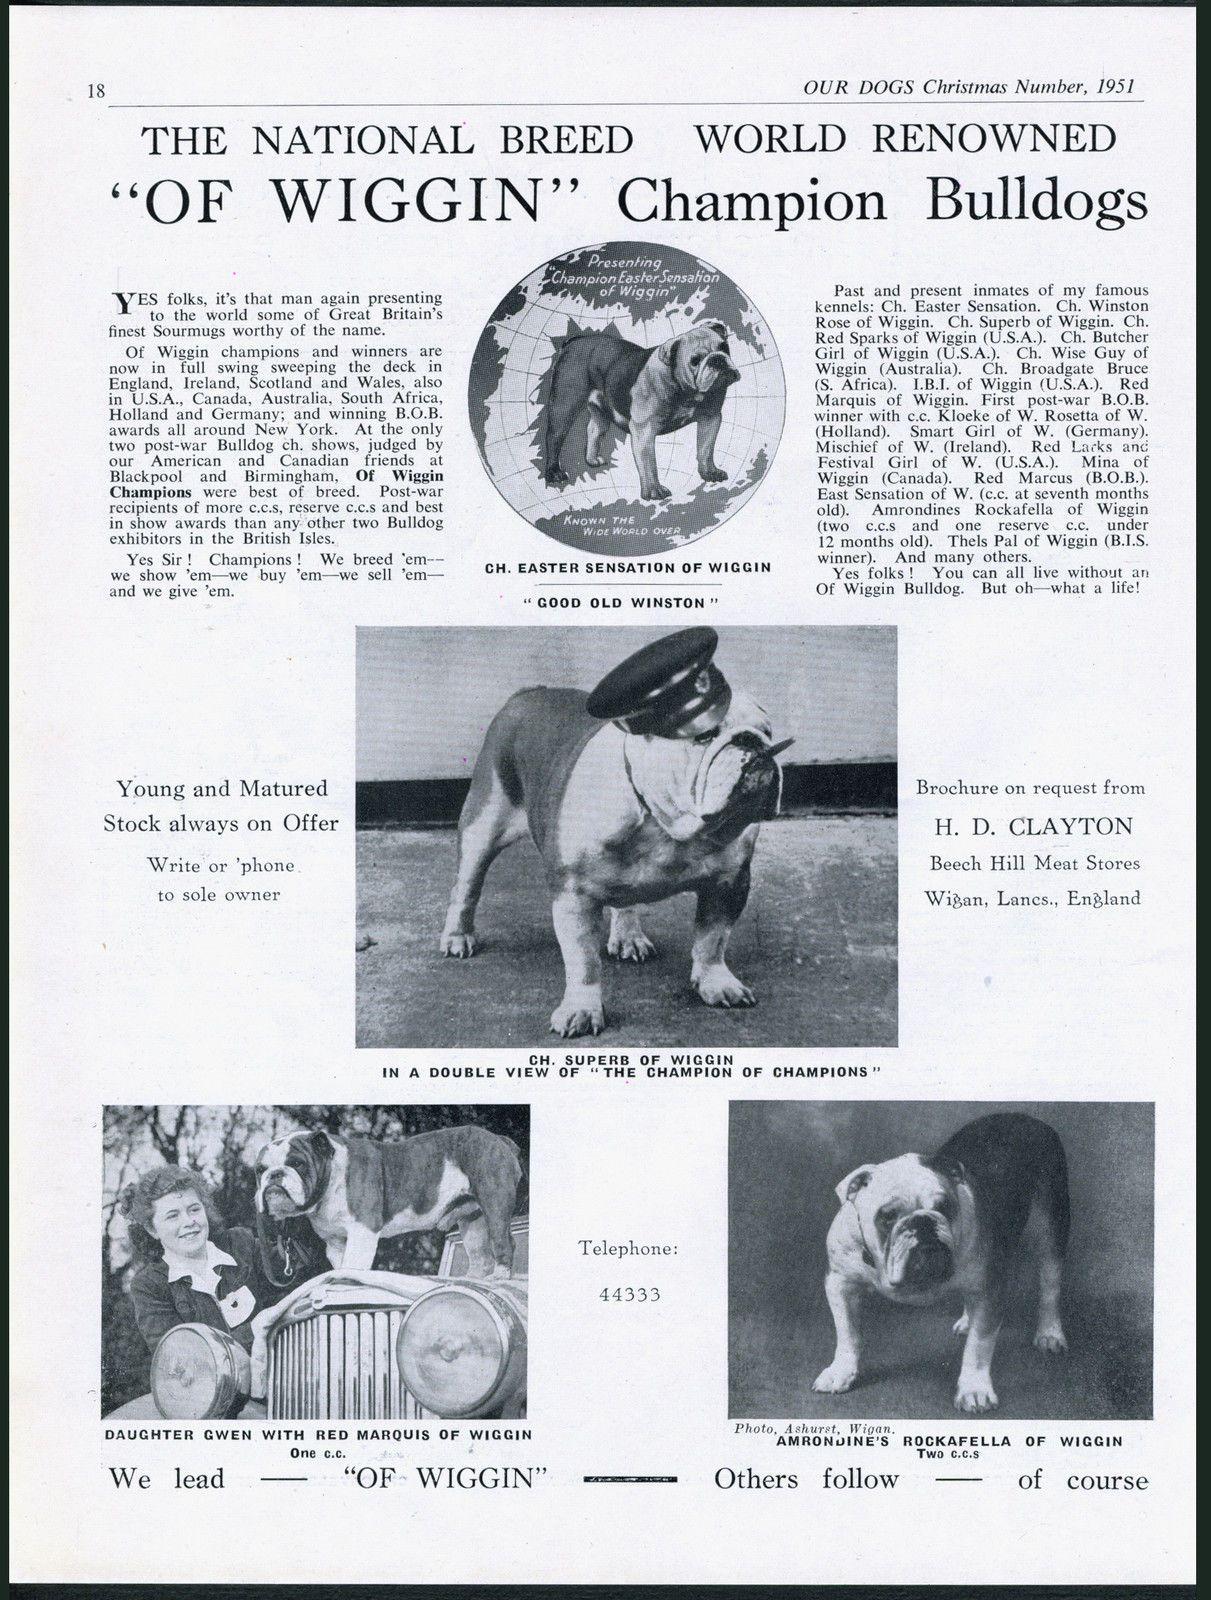 1951 Dog Wiggin Breed Kennel Christmas Dog Dogs British Bulldog